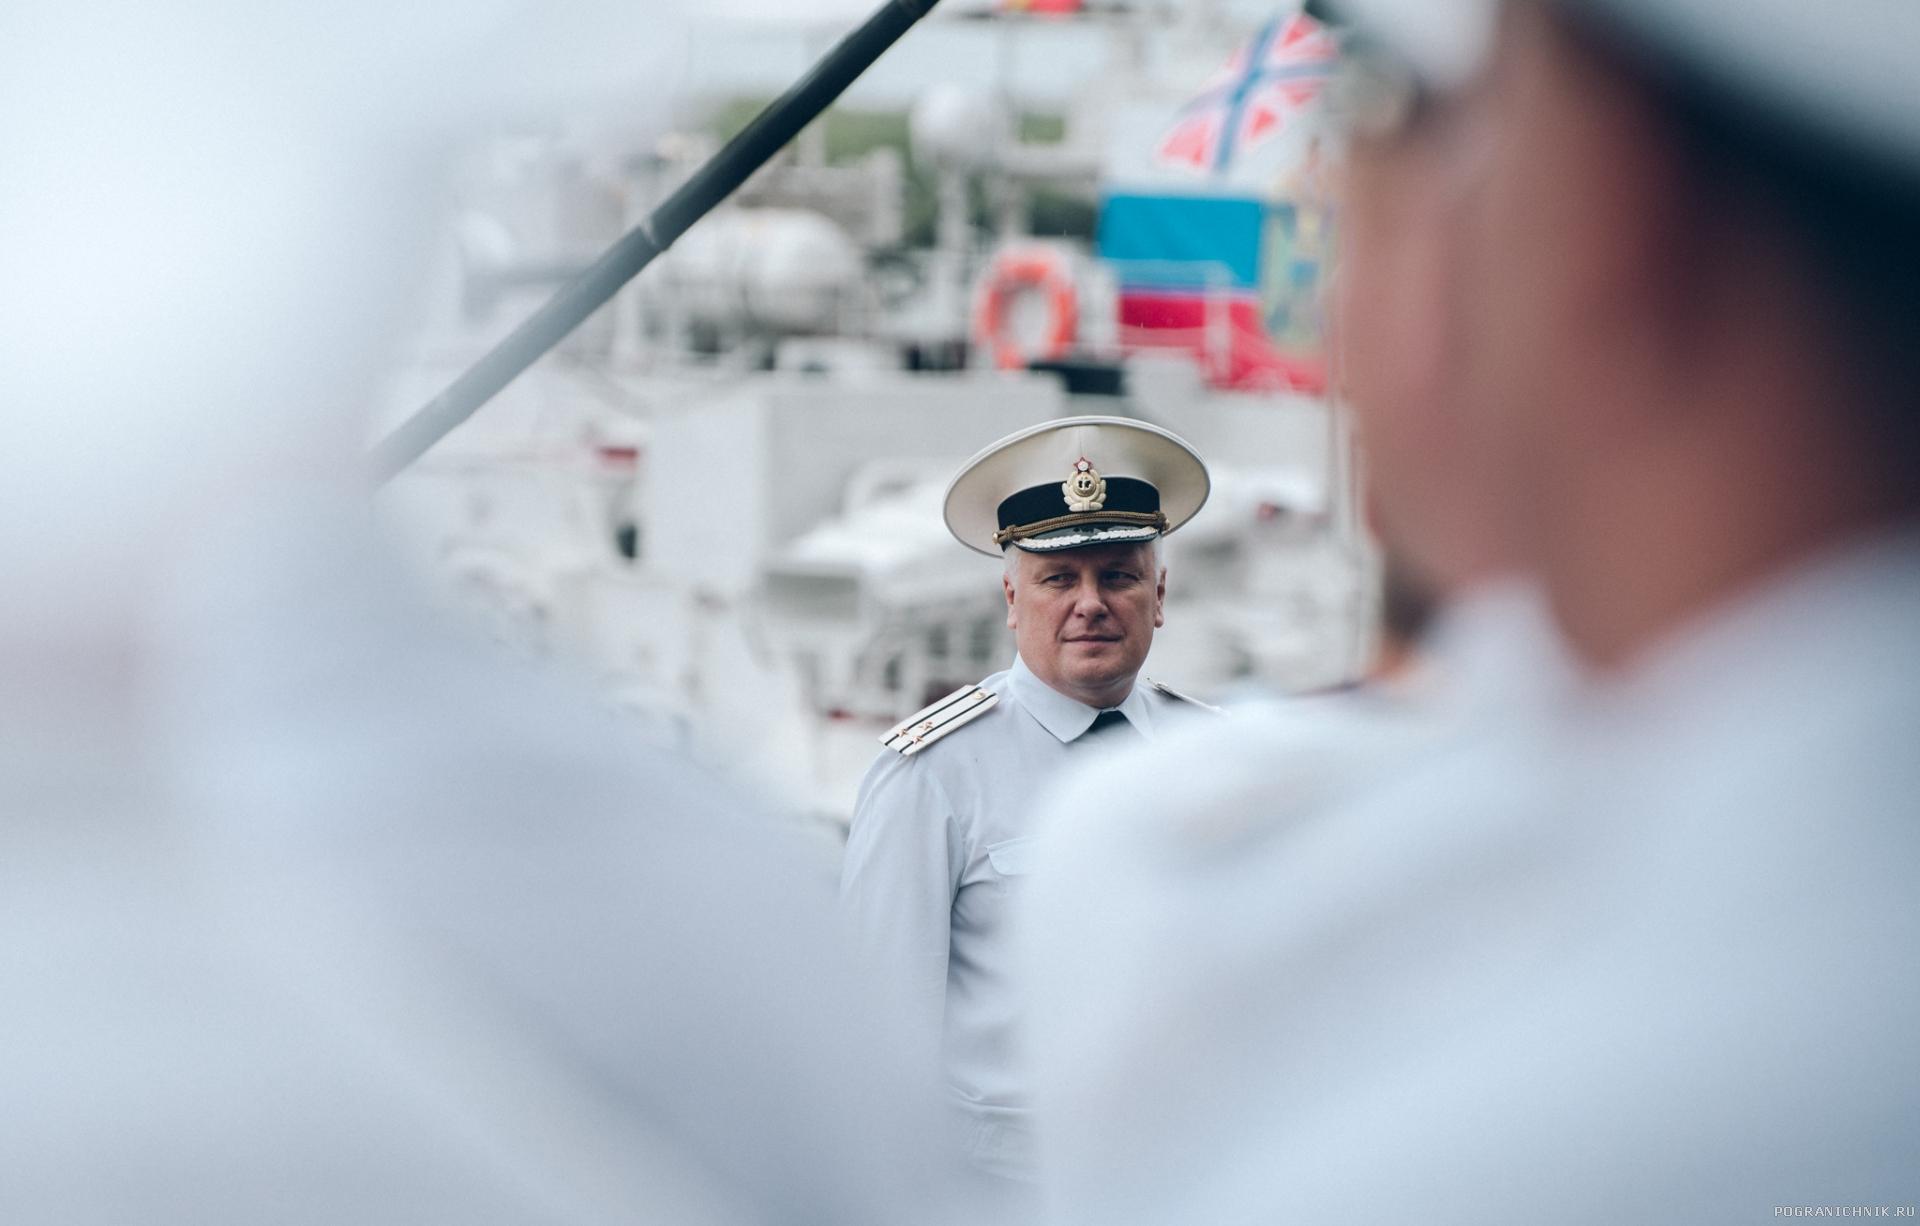 Комбриг капитан 1-го ранга Карасев 28.07. 2017 г.